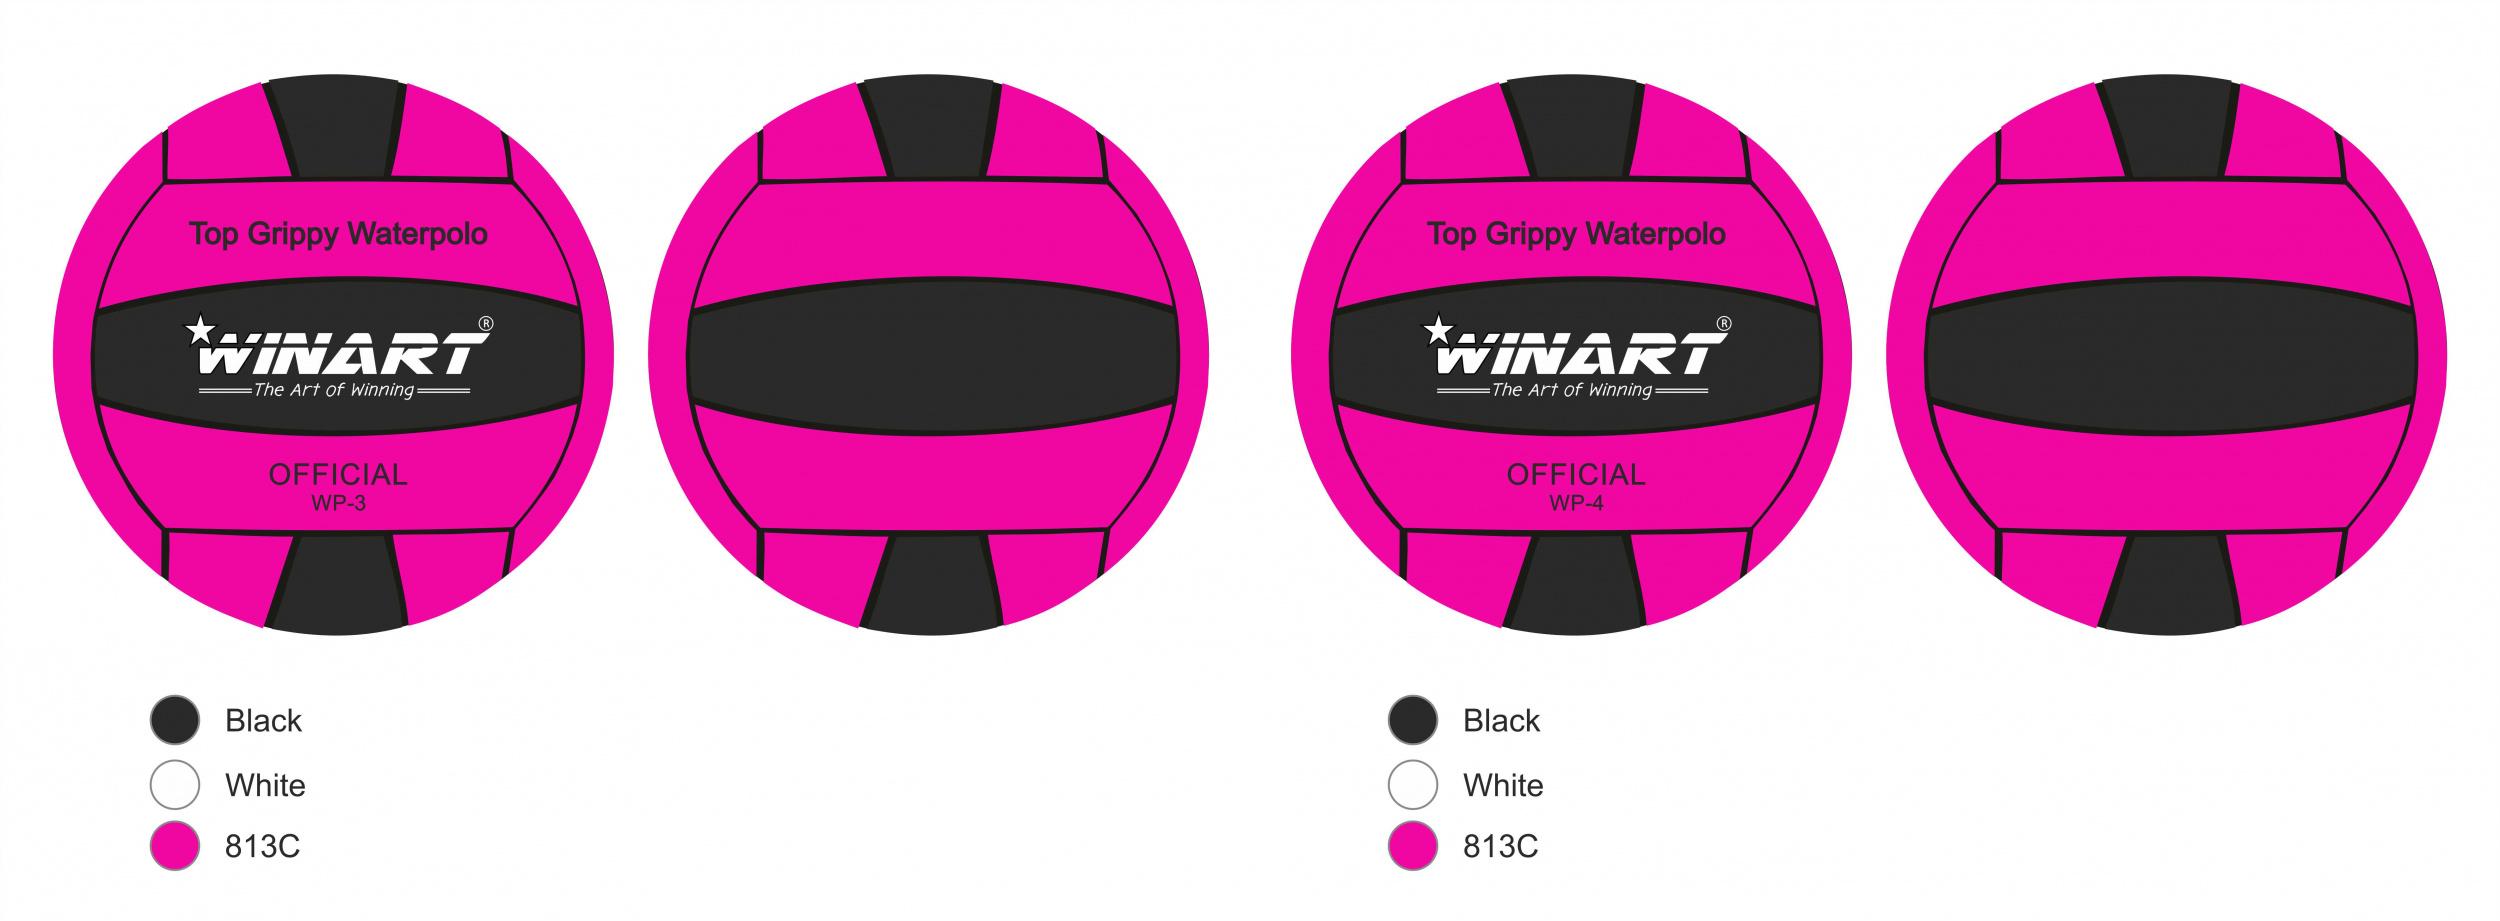 Winart Waterpolobal pink/black mt.4